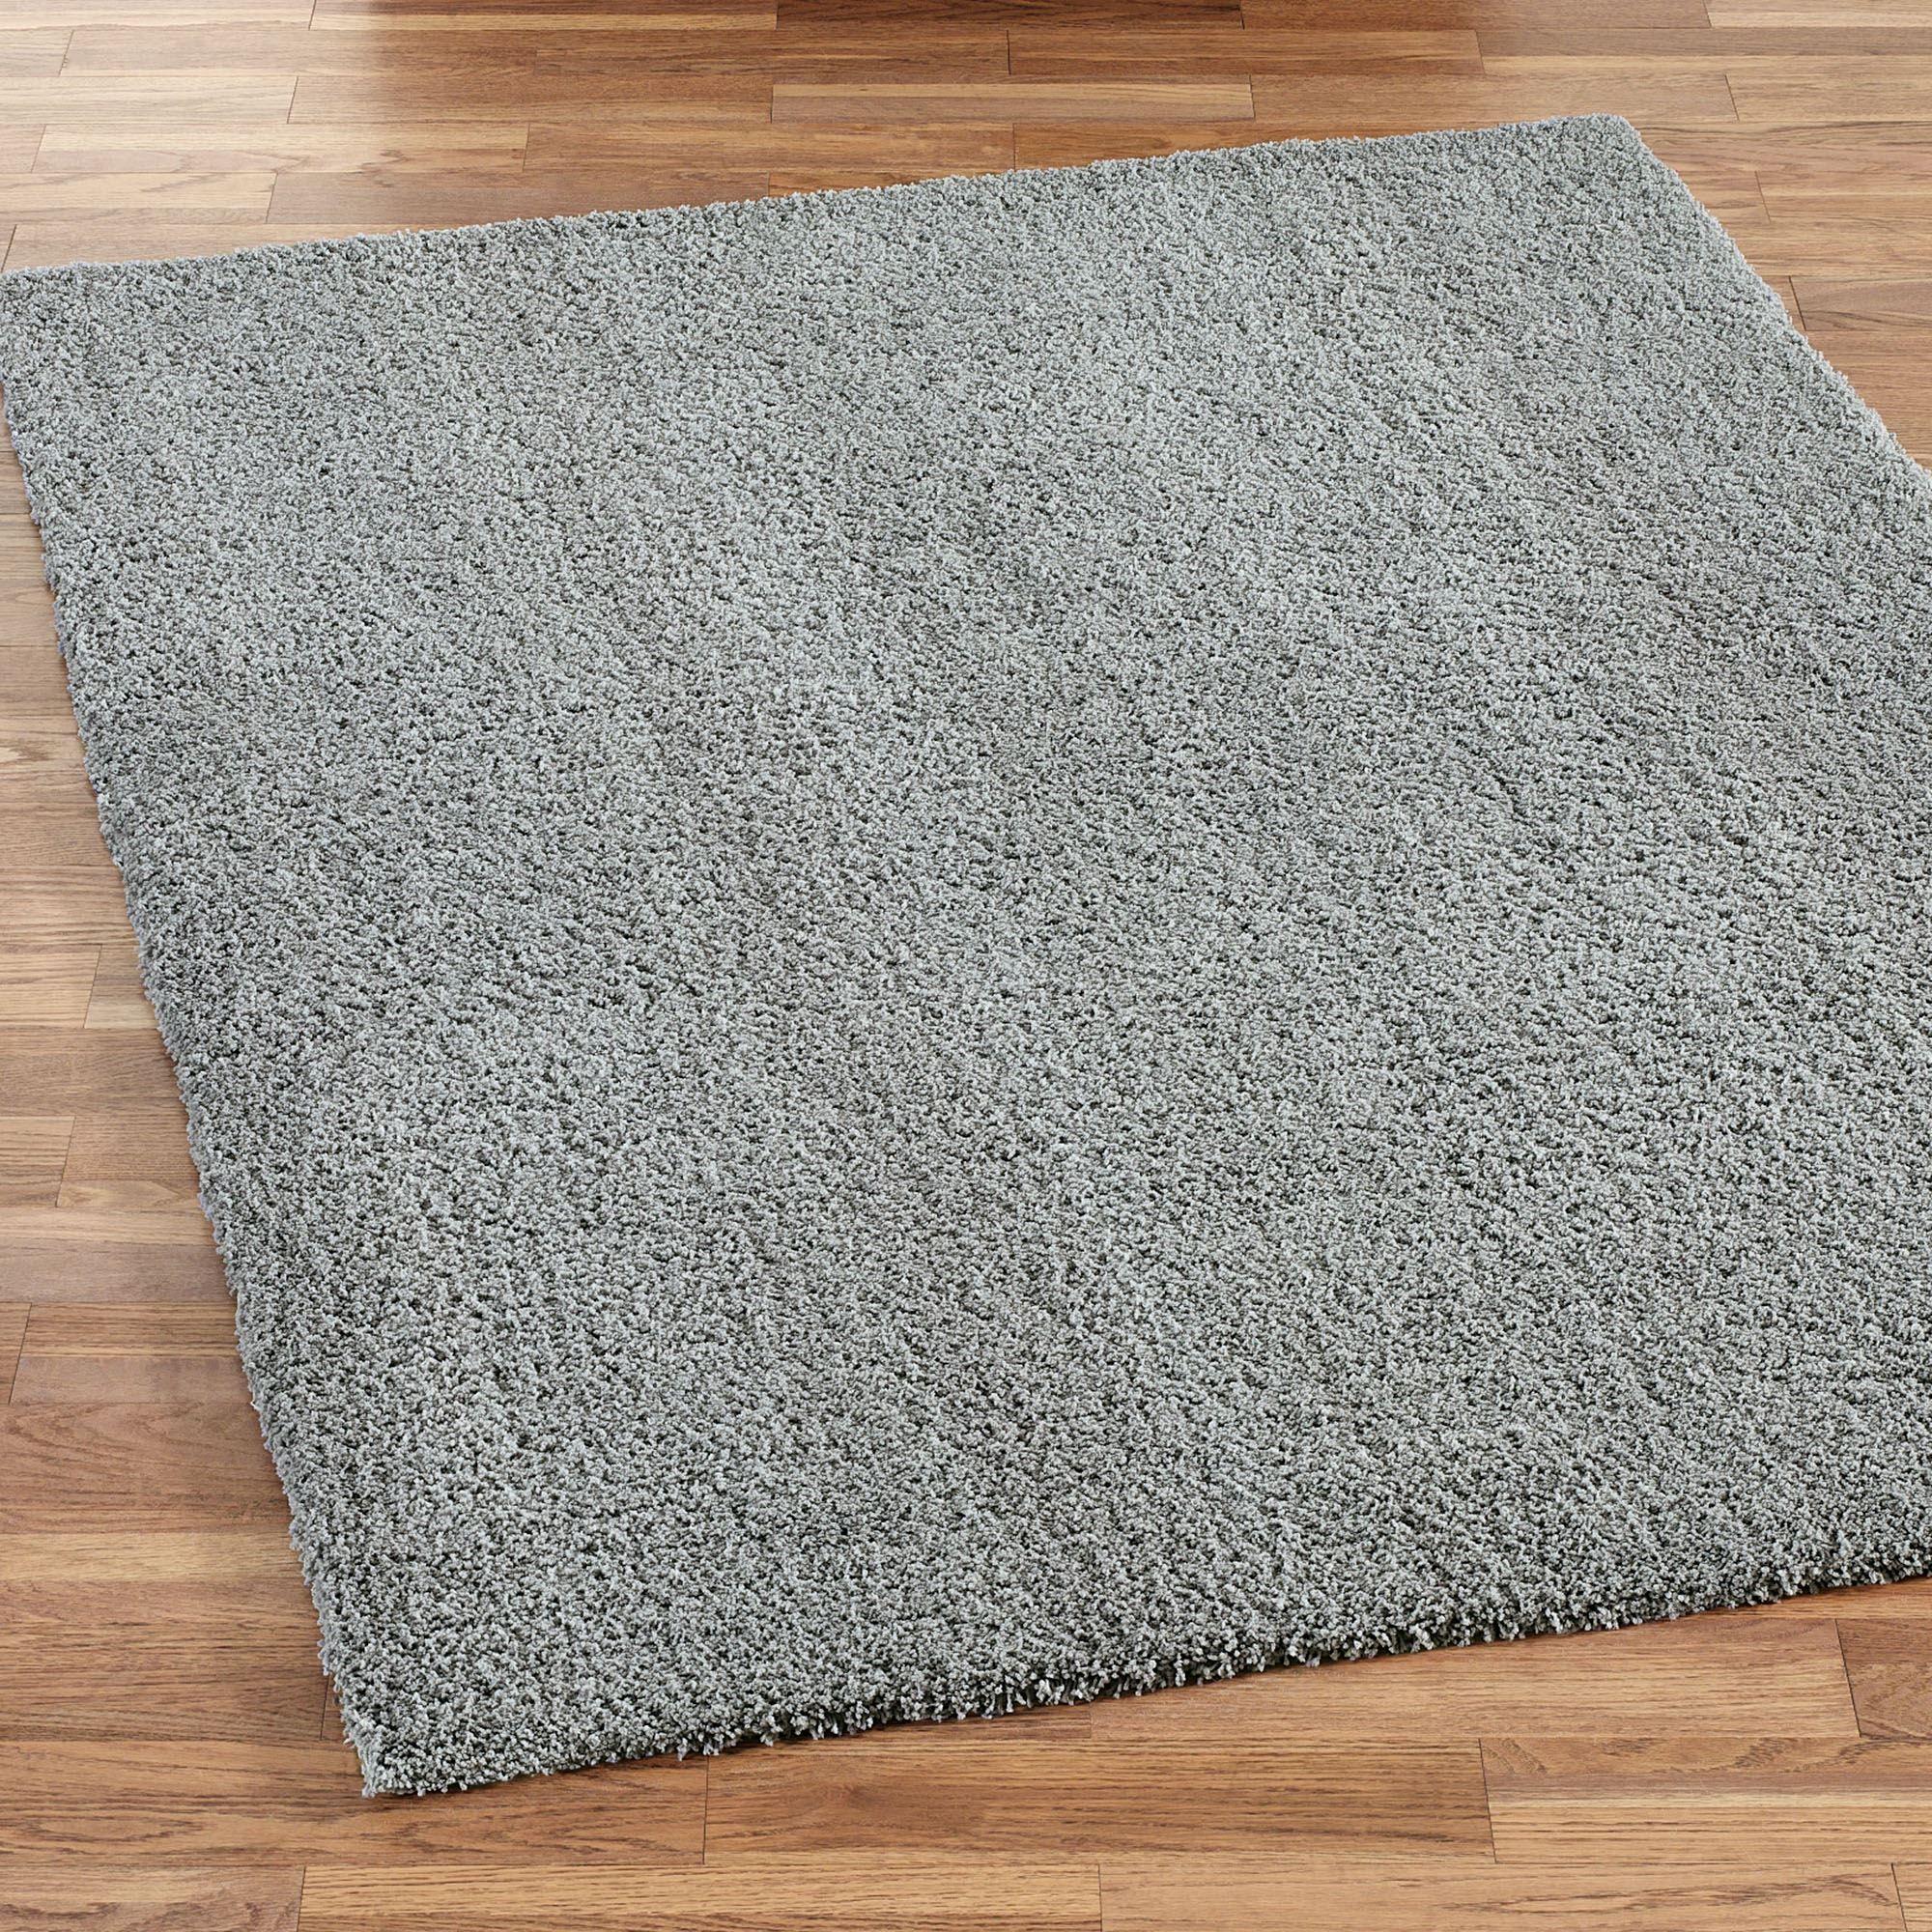 handmade dp com kitchen solid and rug dining soft rugs amazon silken plush shag area